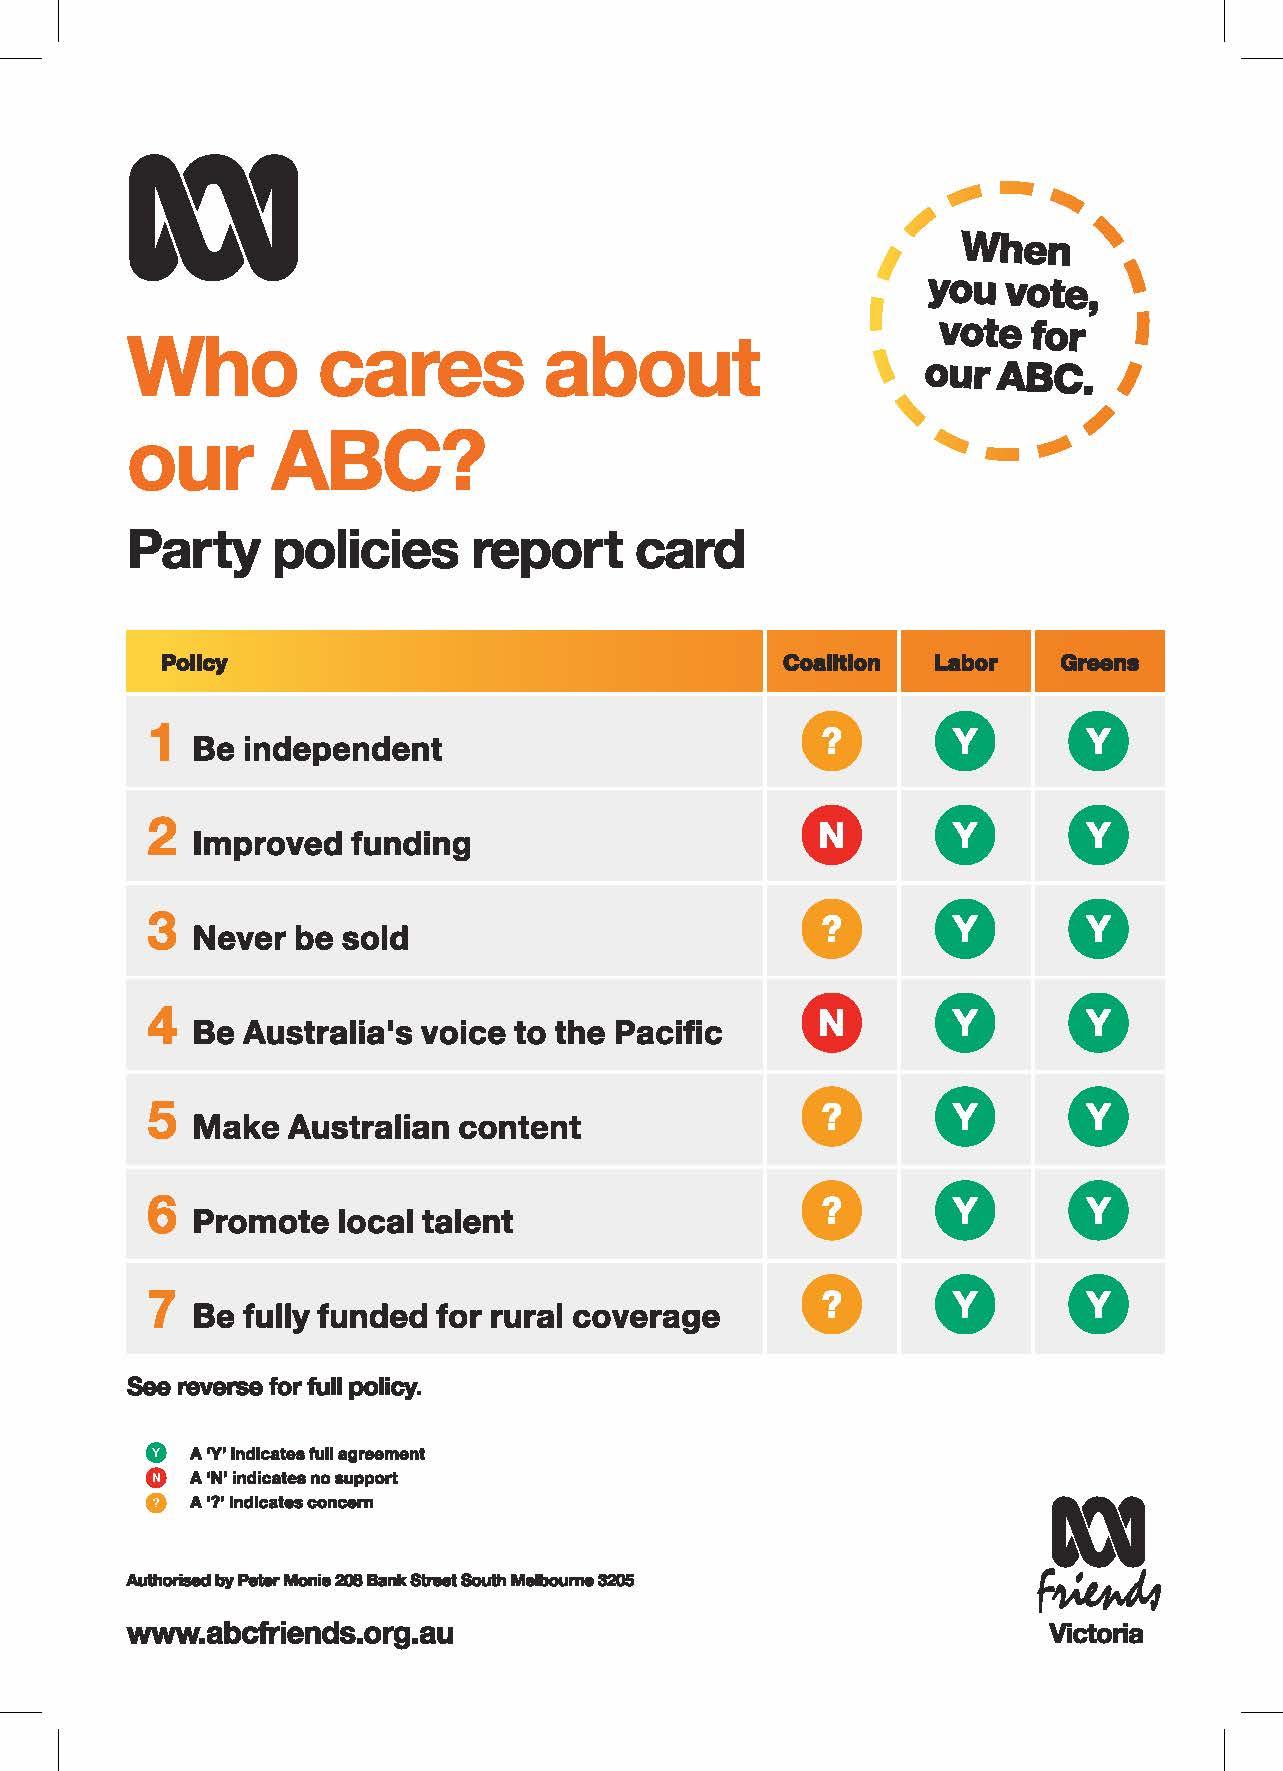 ABC Friends Victoria Scorecard